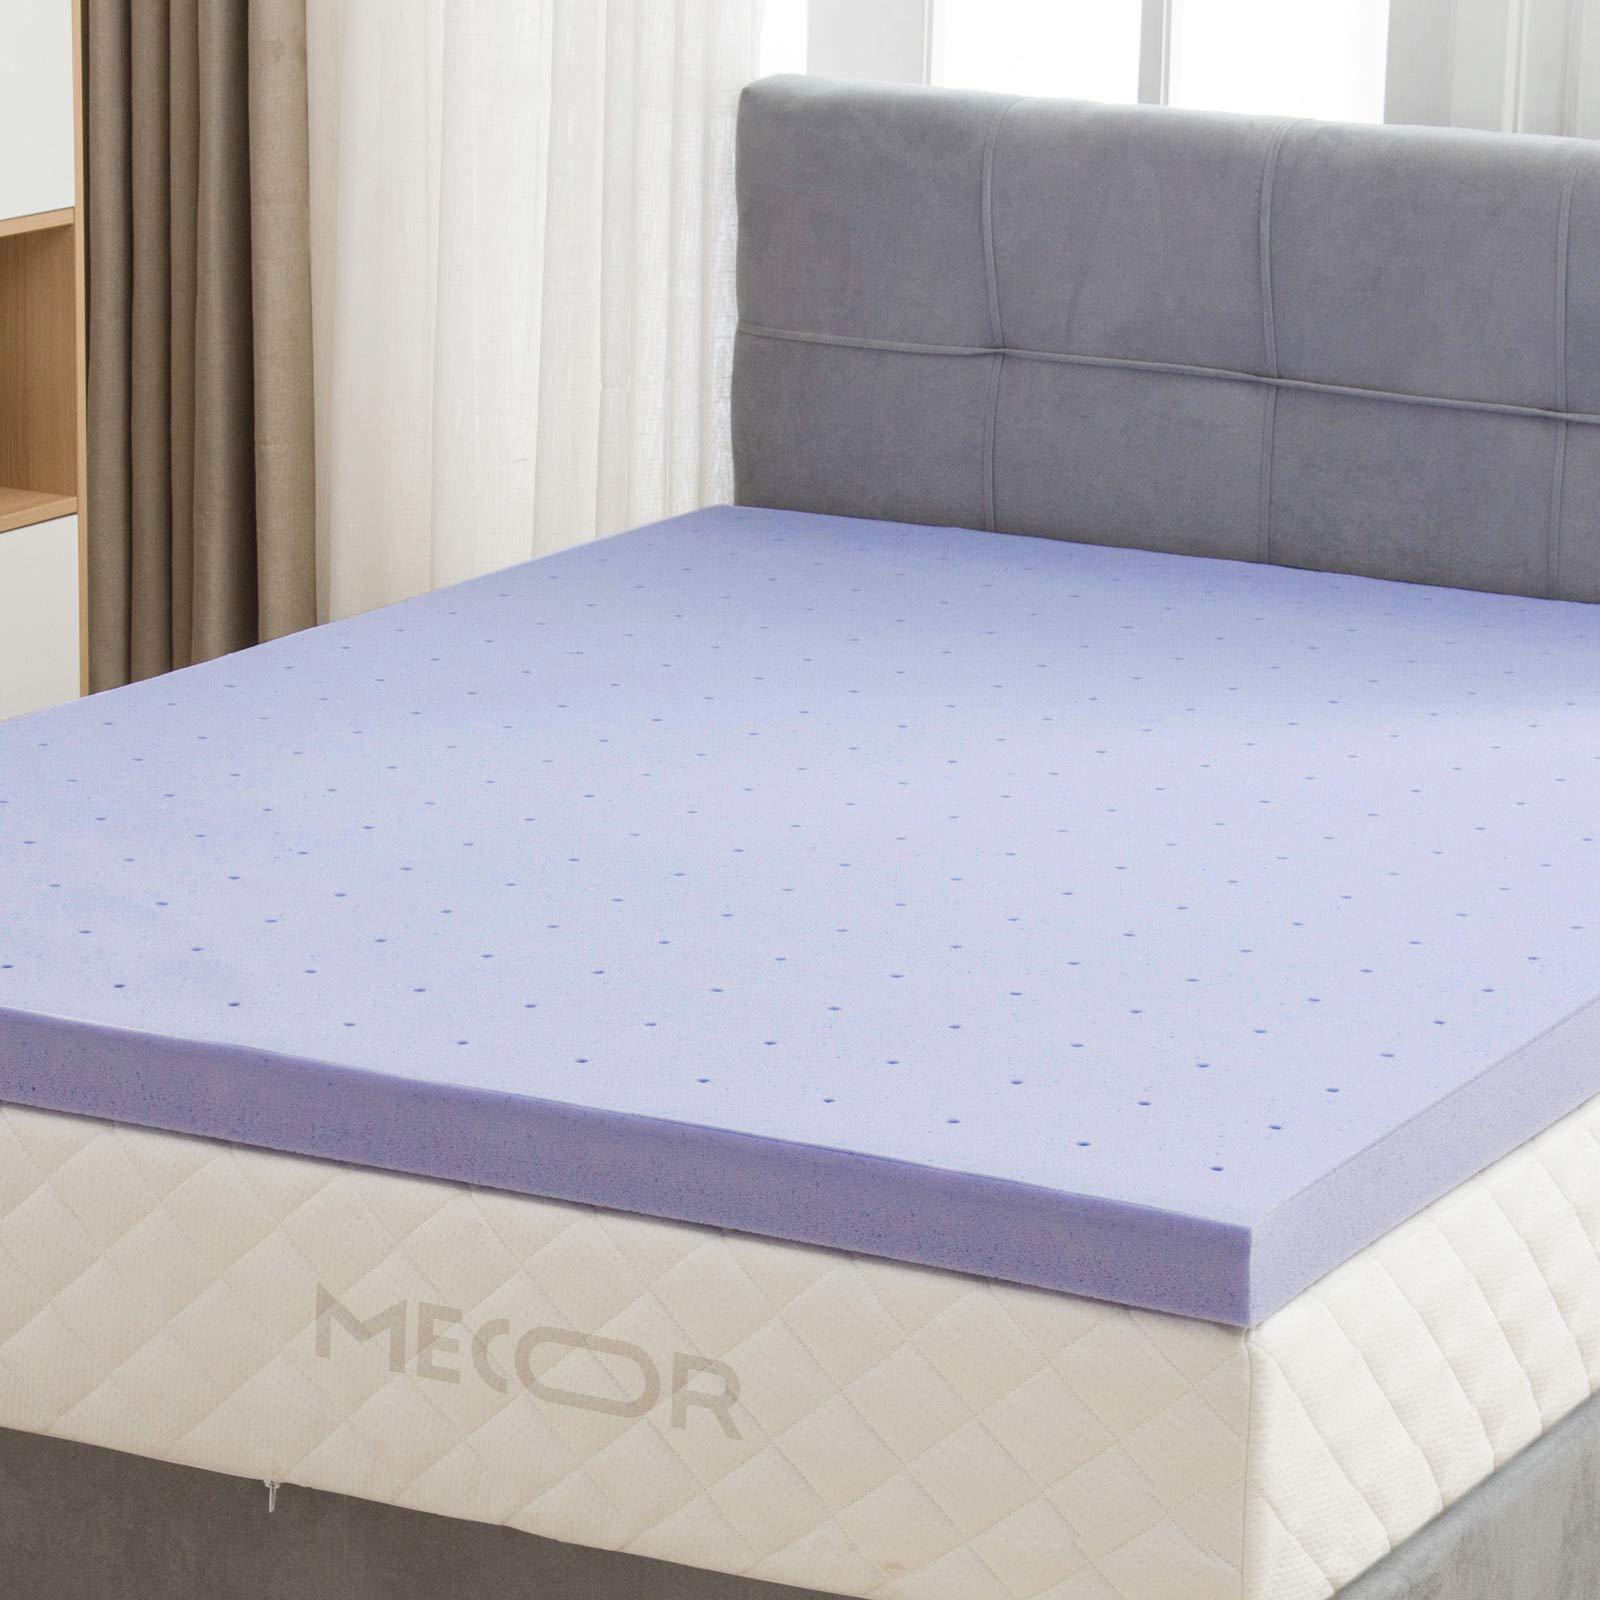 Mecor 4 Inch 4'' Queen Size Gel Infused Memory Foam Mattress Topper - Ventilated Design, CertiPUR-US Certified Foam, Queen/Purple